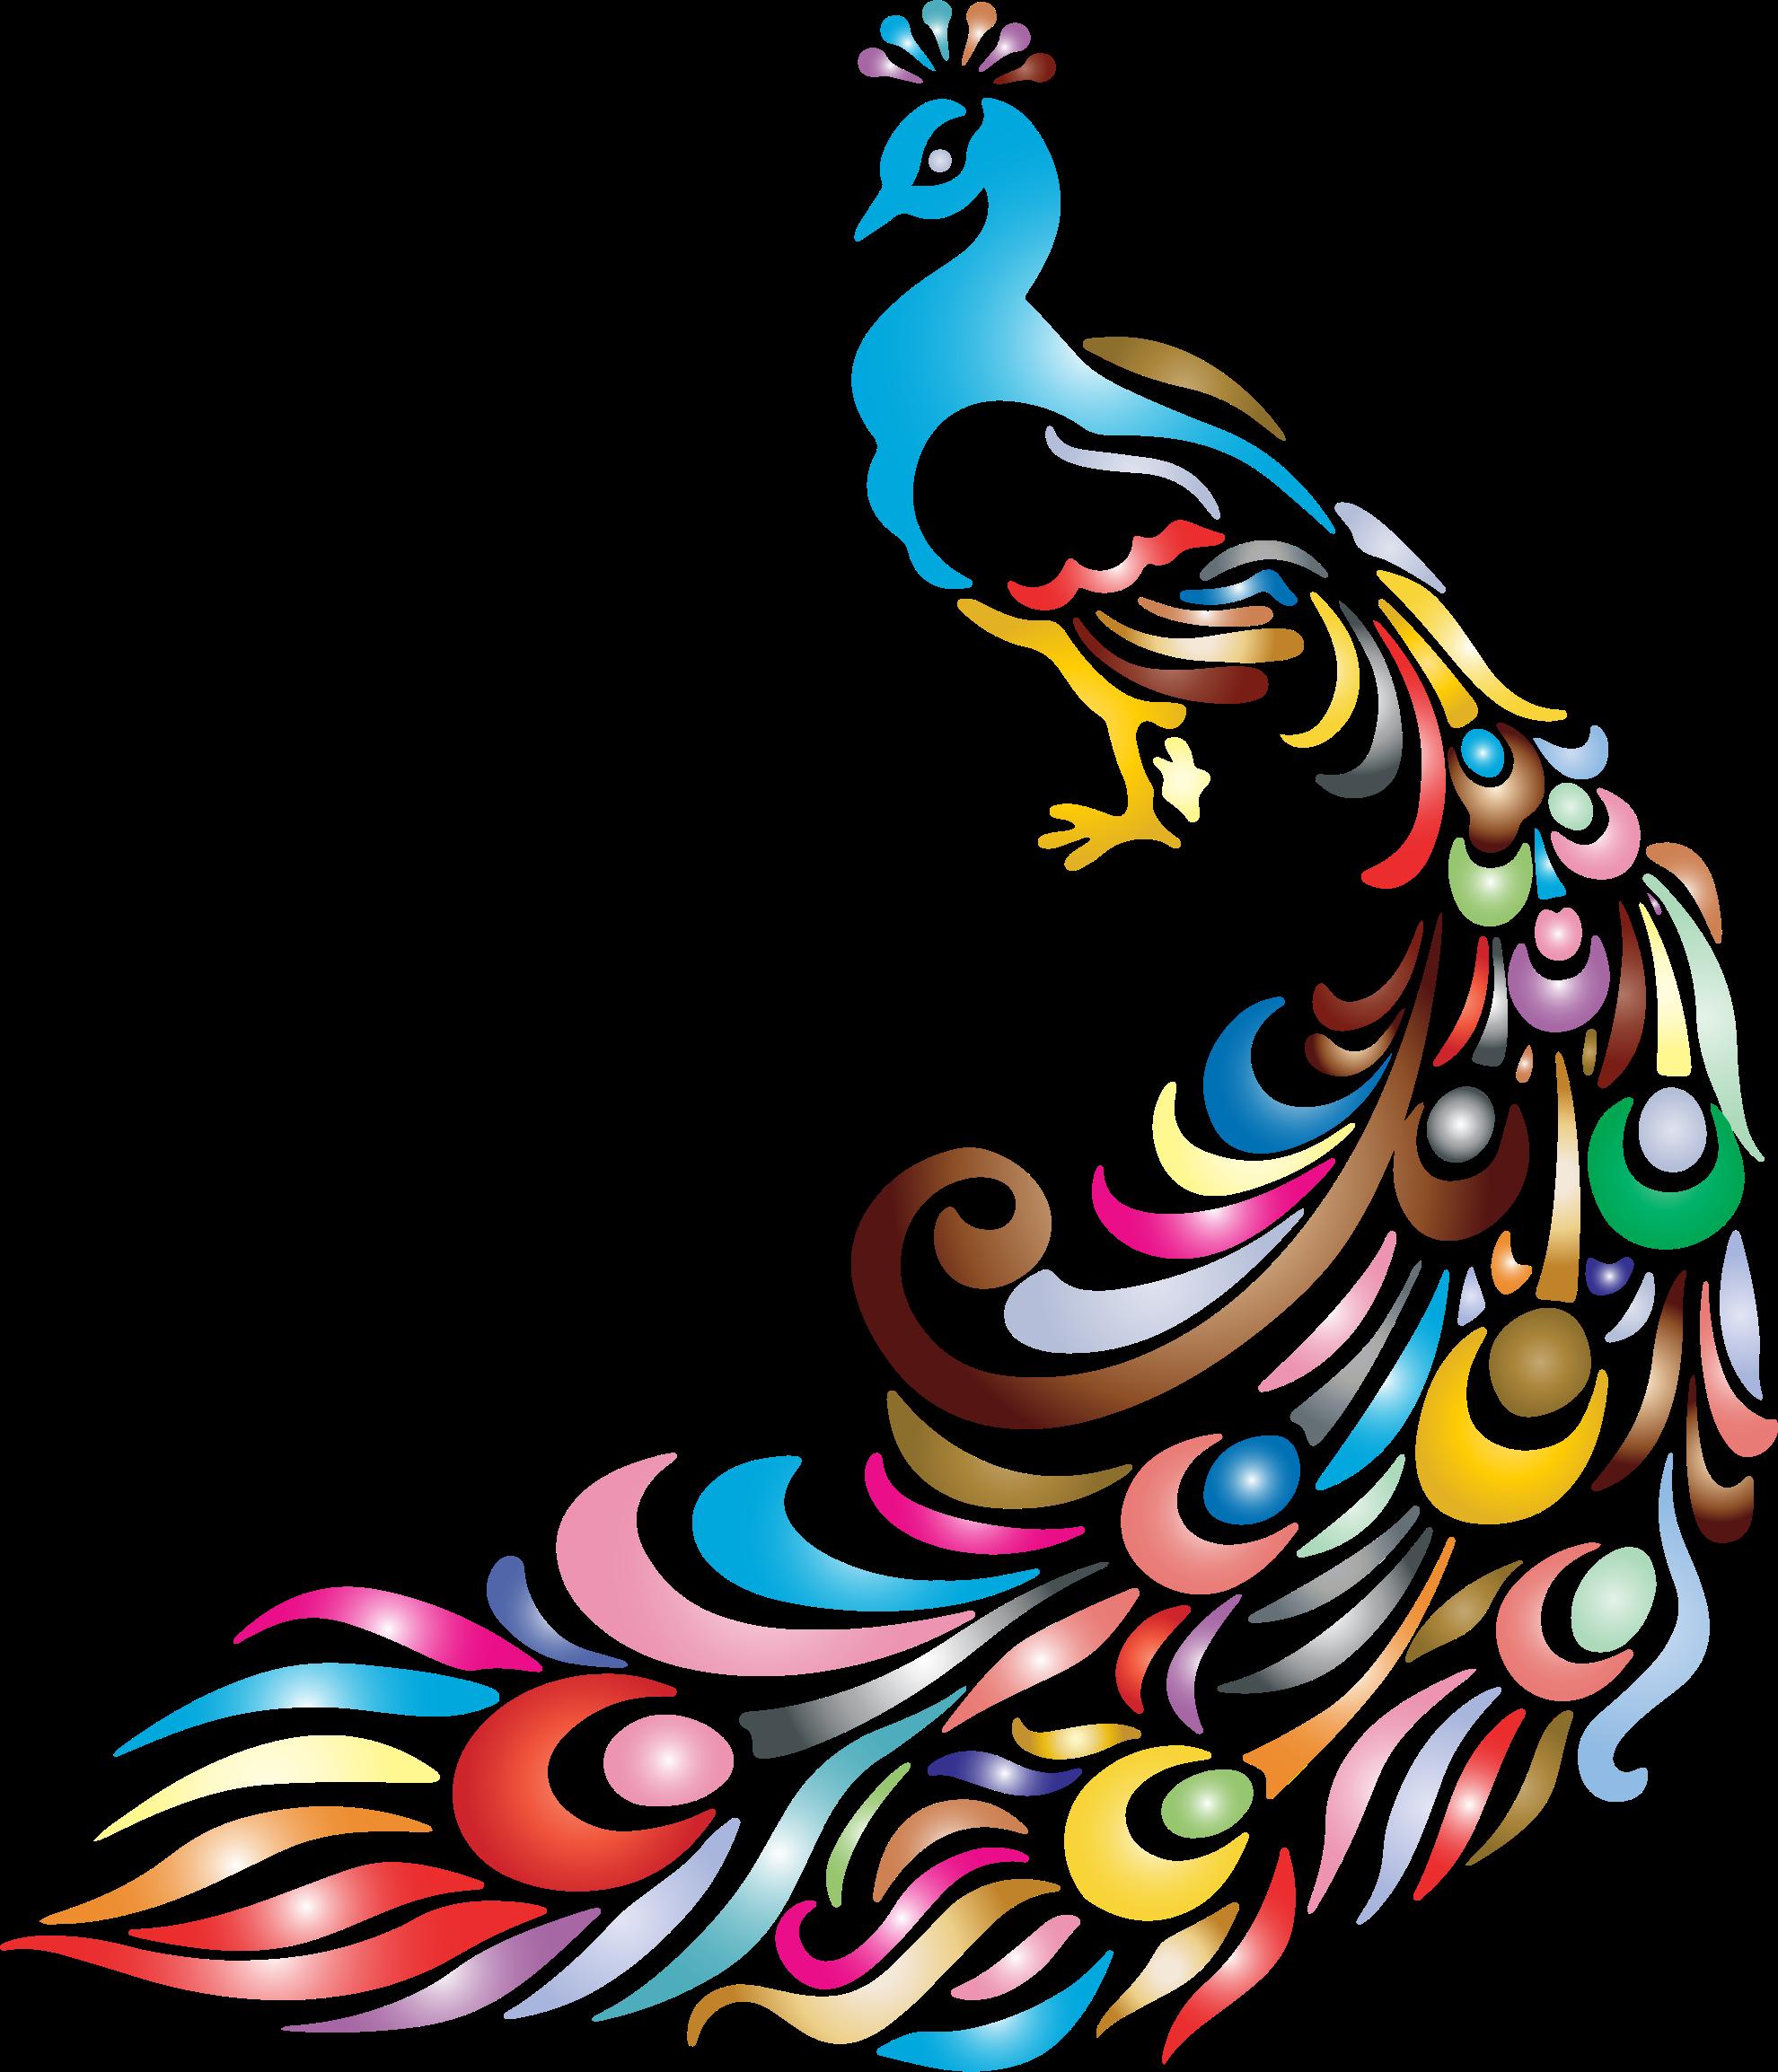 1980x2308 Cartoon Peacock Vector Clip Art Illustration With Simple